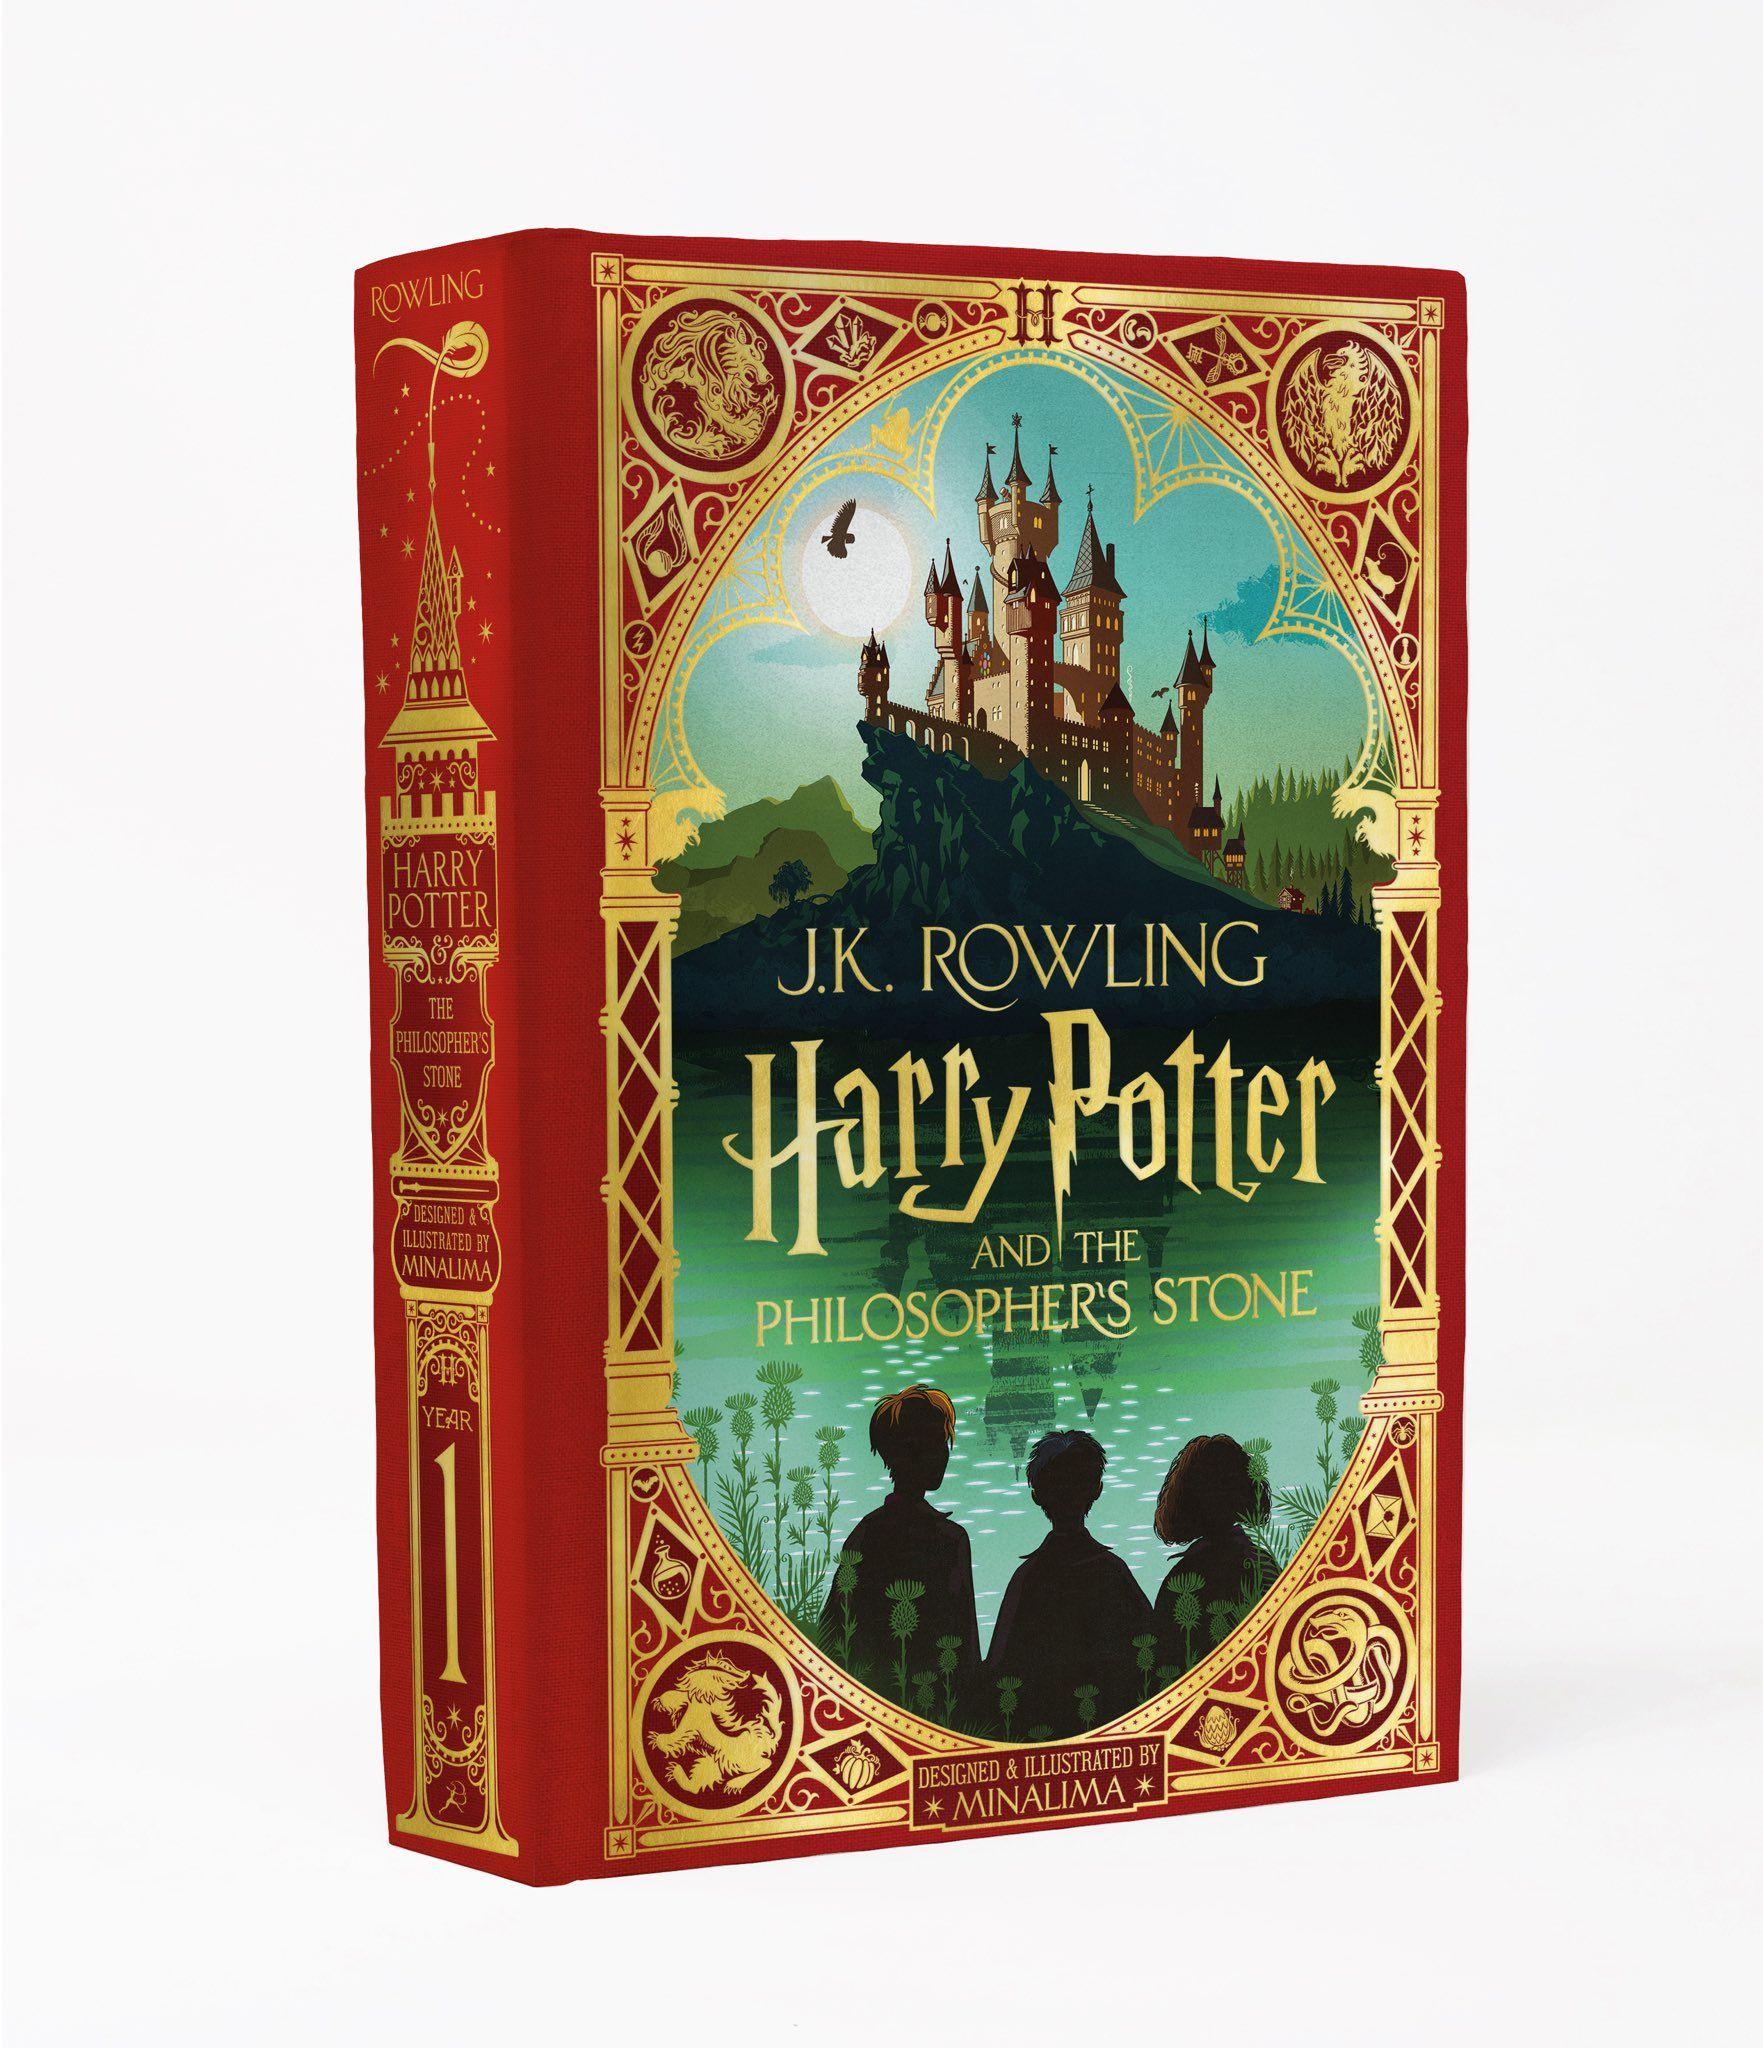 Minalima On Twitter Rowling Harry Potter Harry Potter Books Harry Potter Film